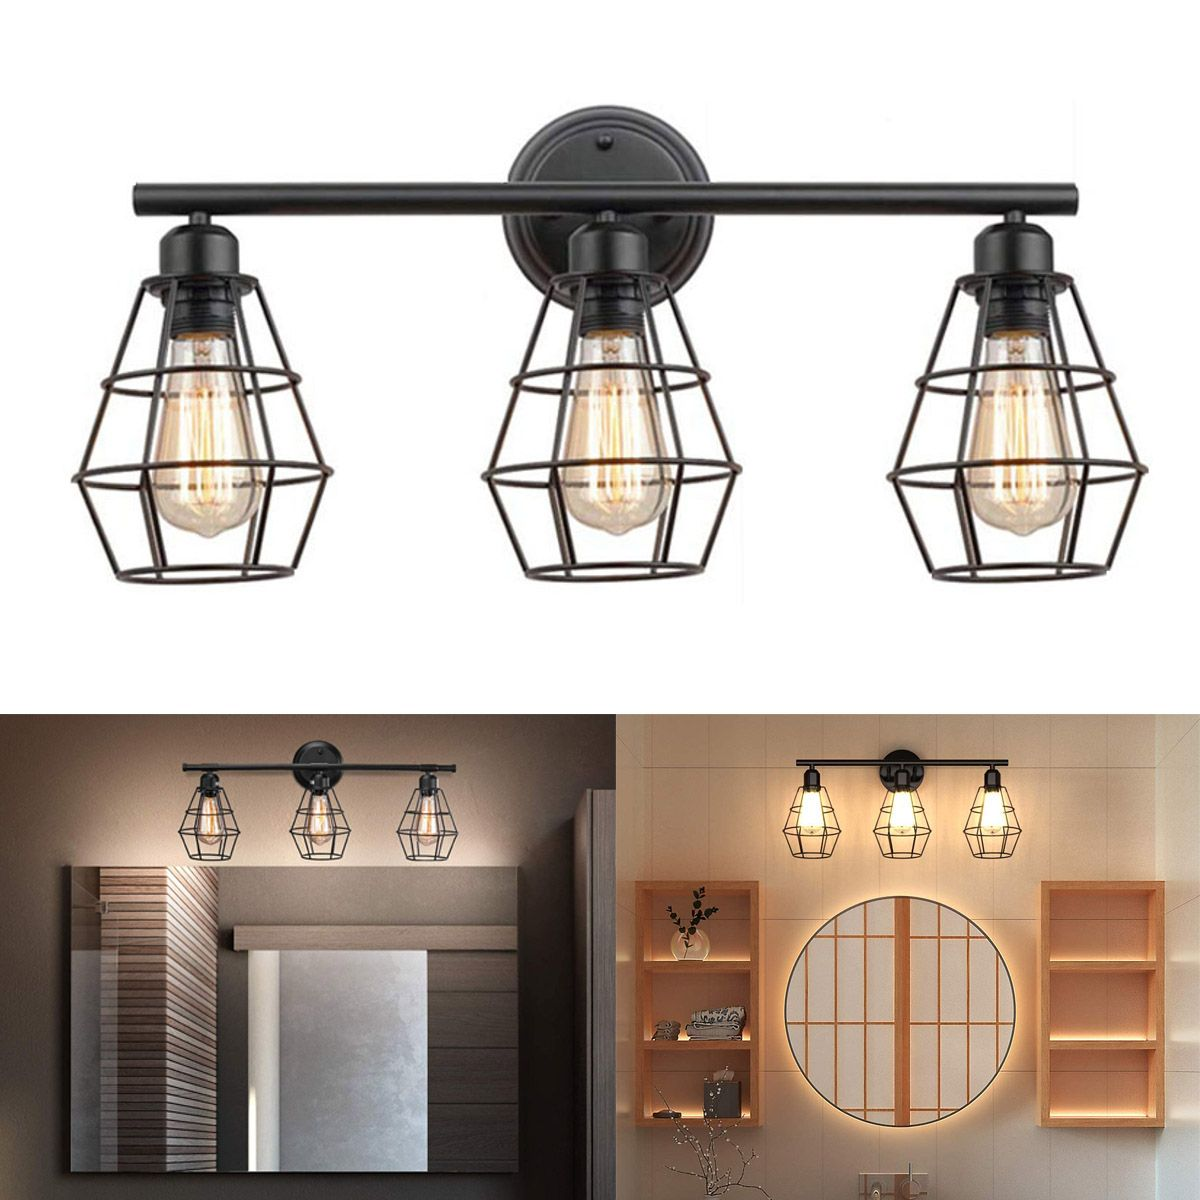 Industrial Bathroom Vanity Light 3 Lights, Vintage Metal